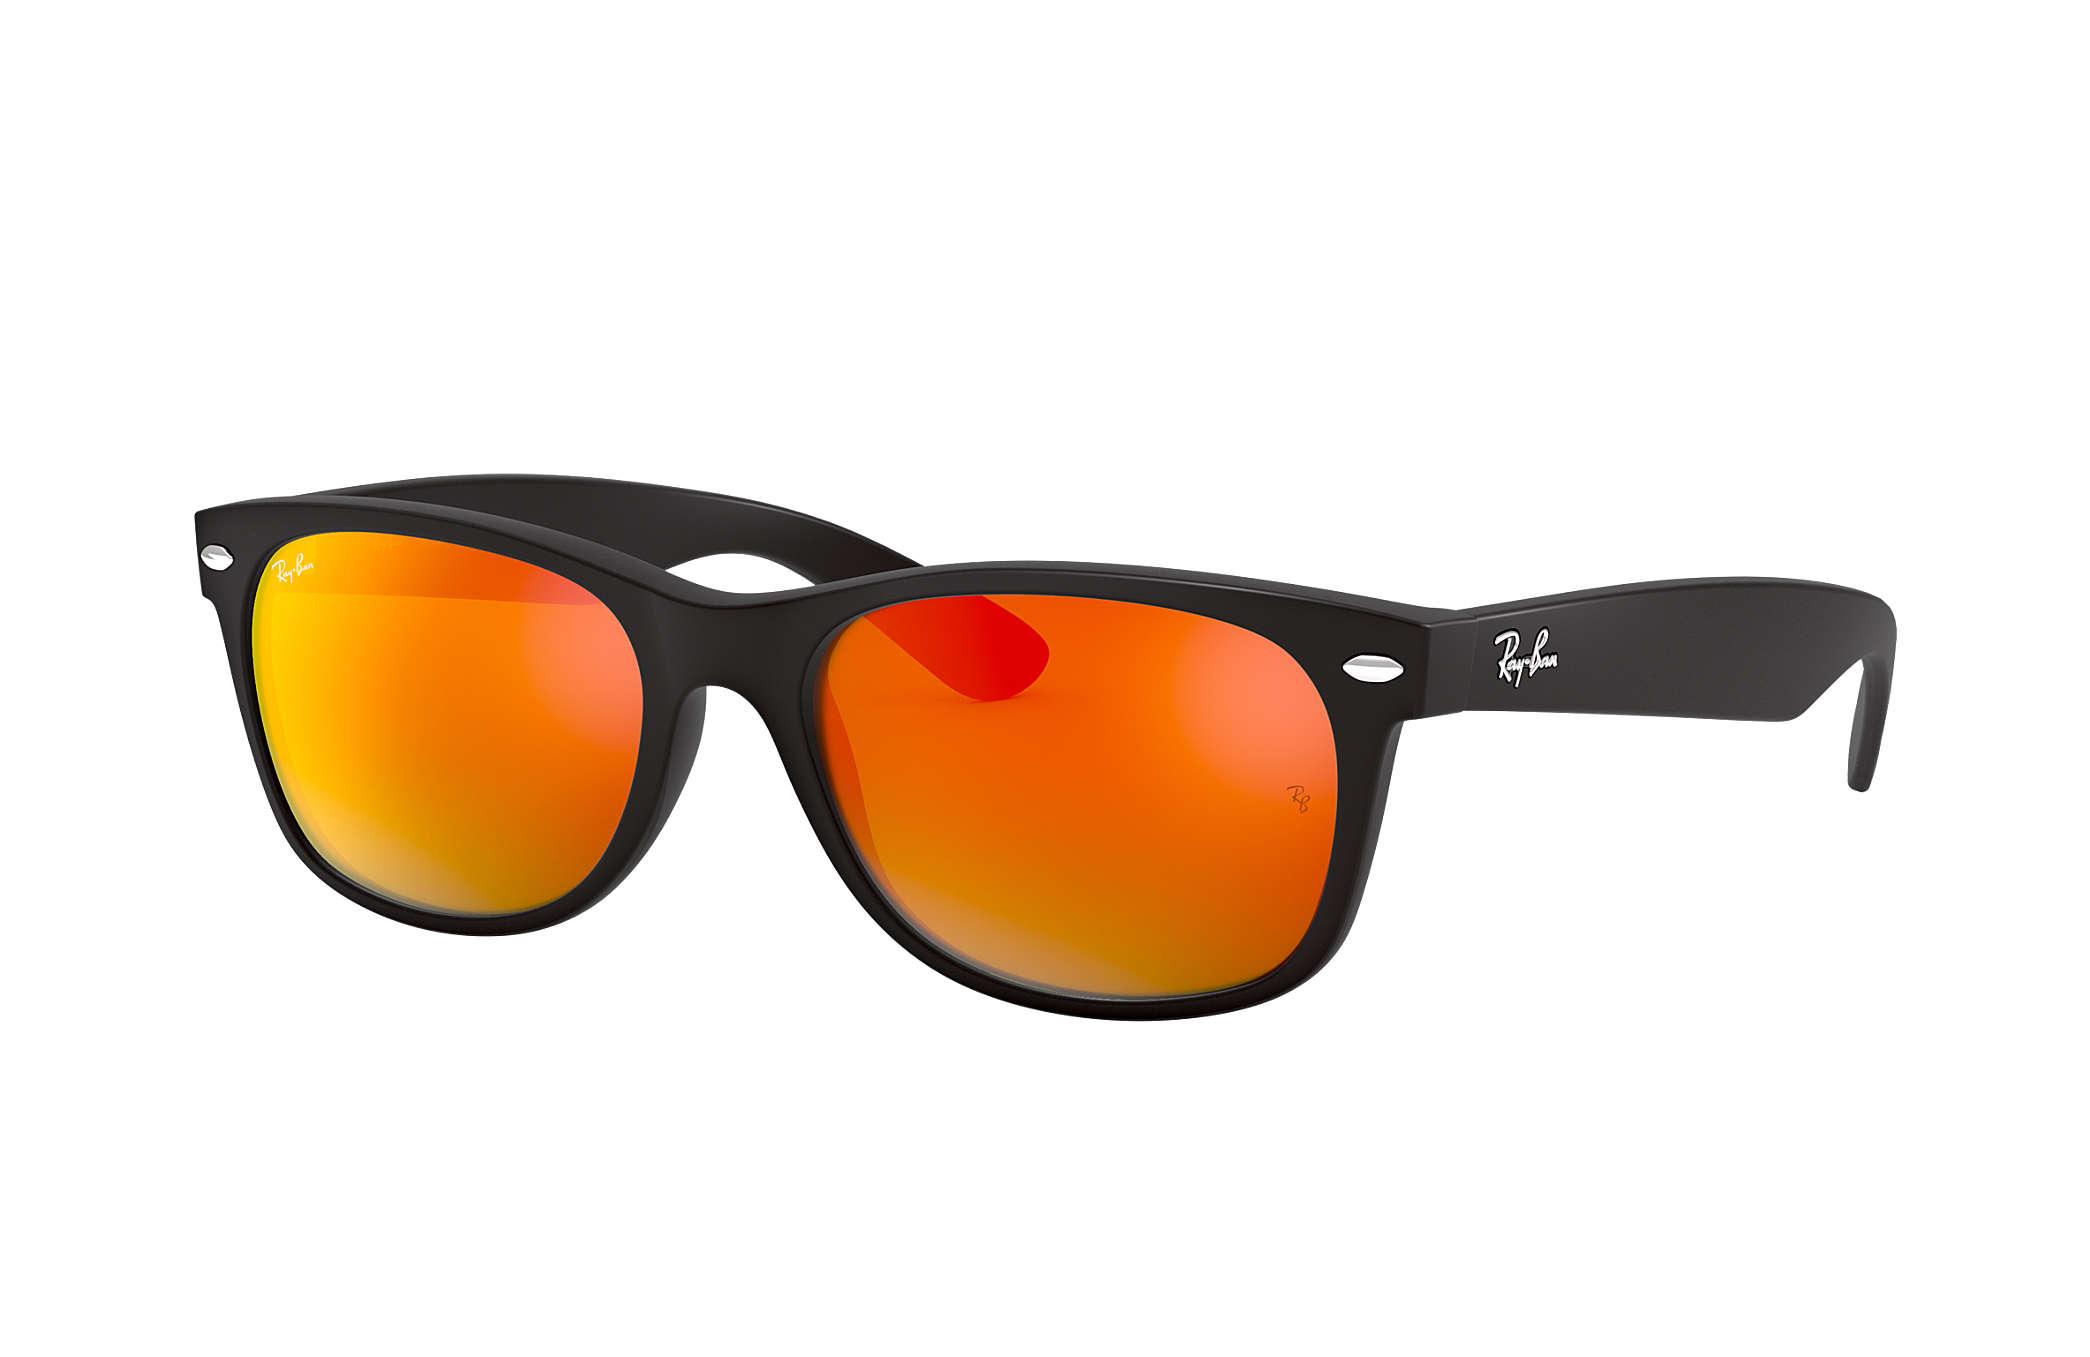 ray ban sunglasses orange lenses